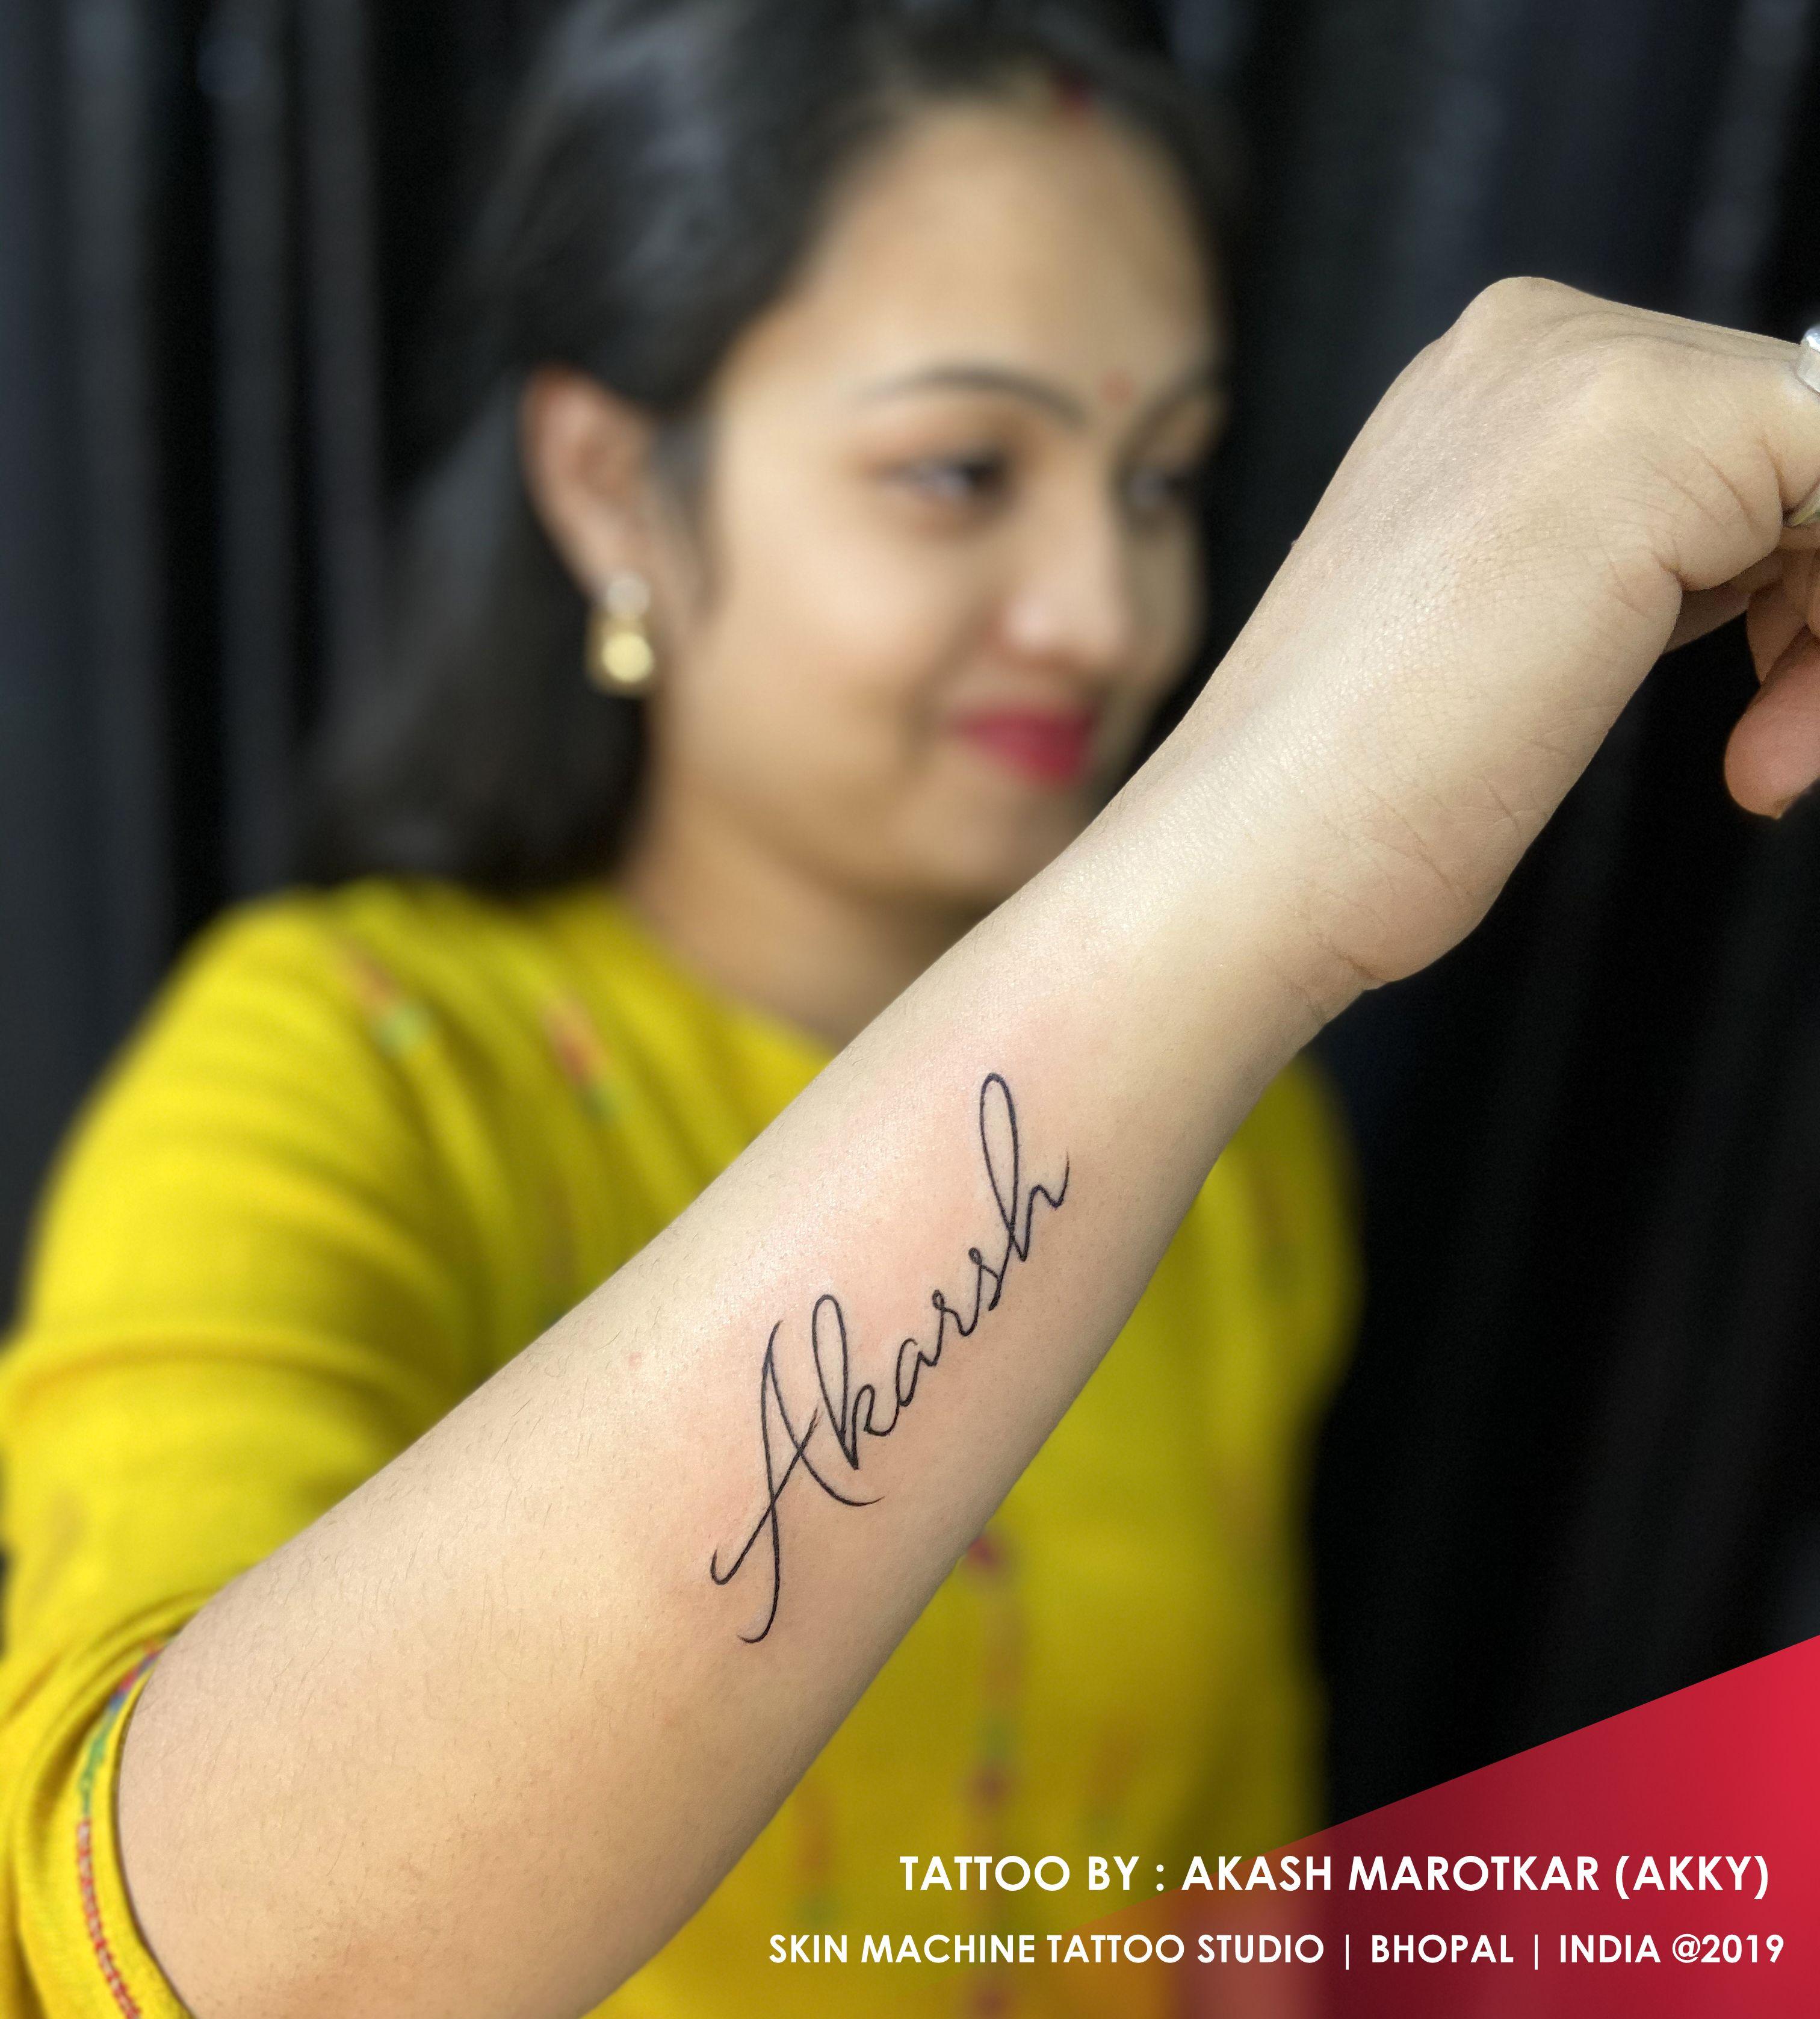 Name Tattoo Name Tattoo Designs Tattoos Tattoo Studio